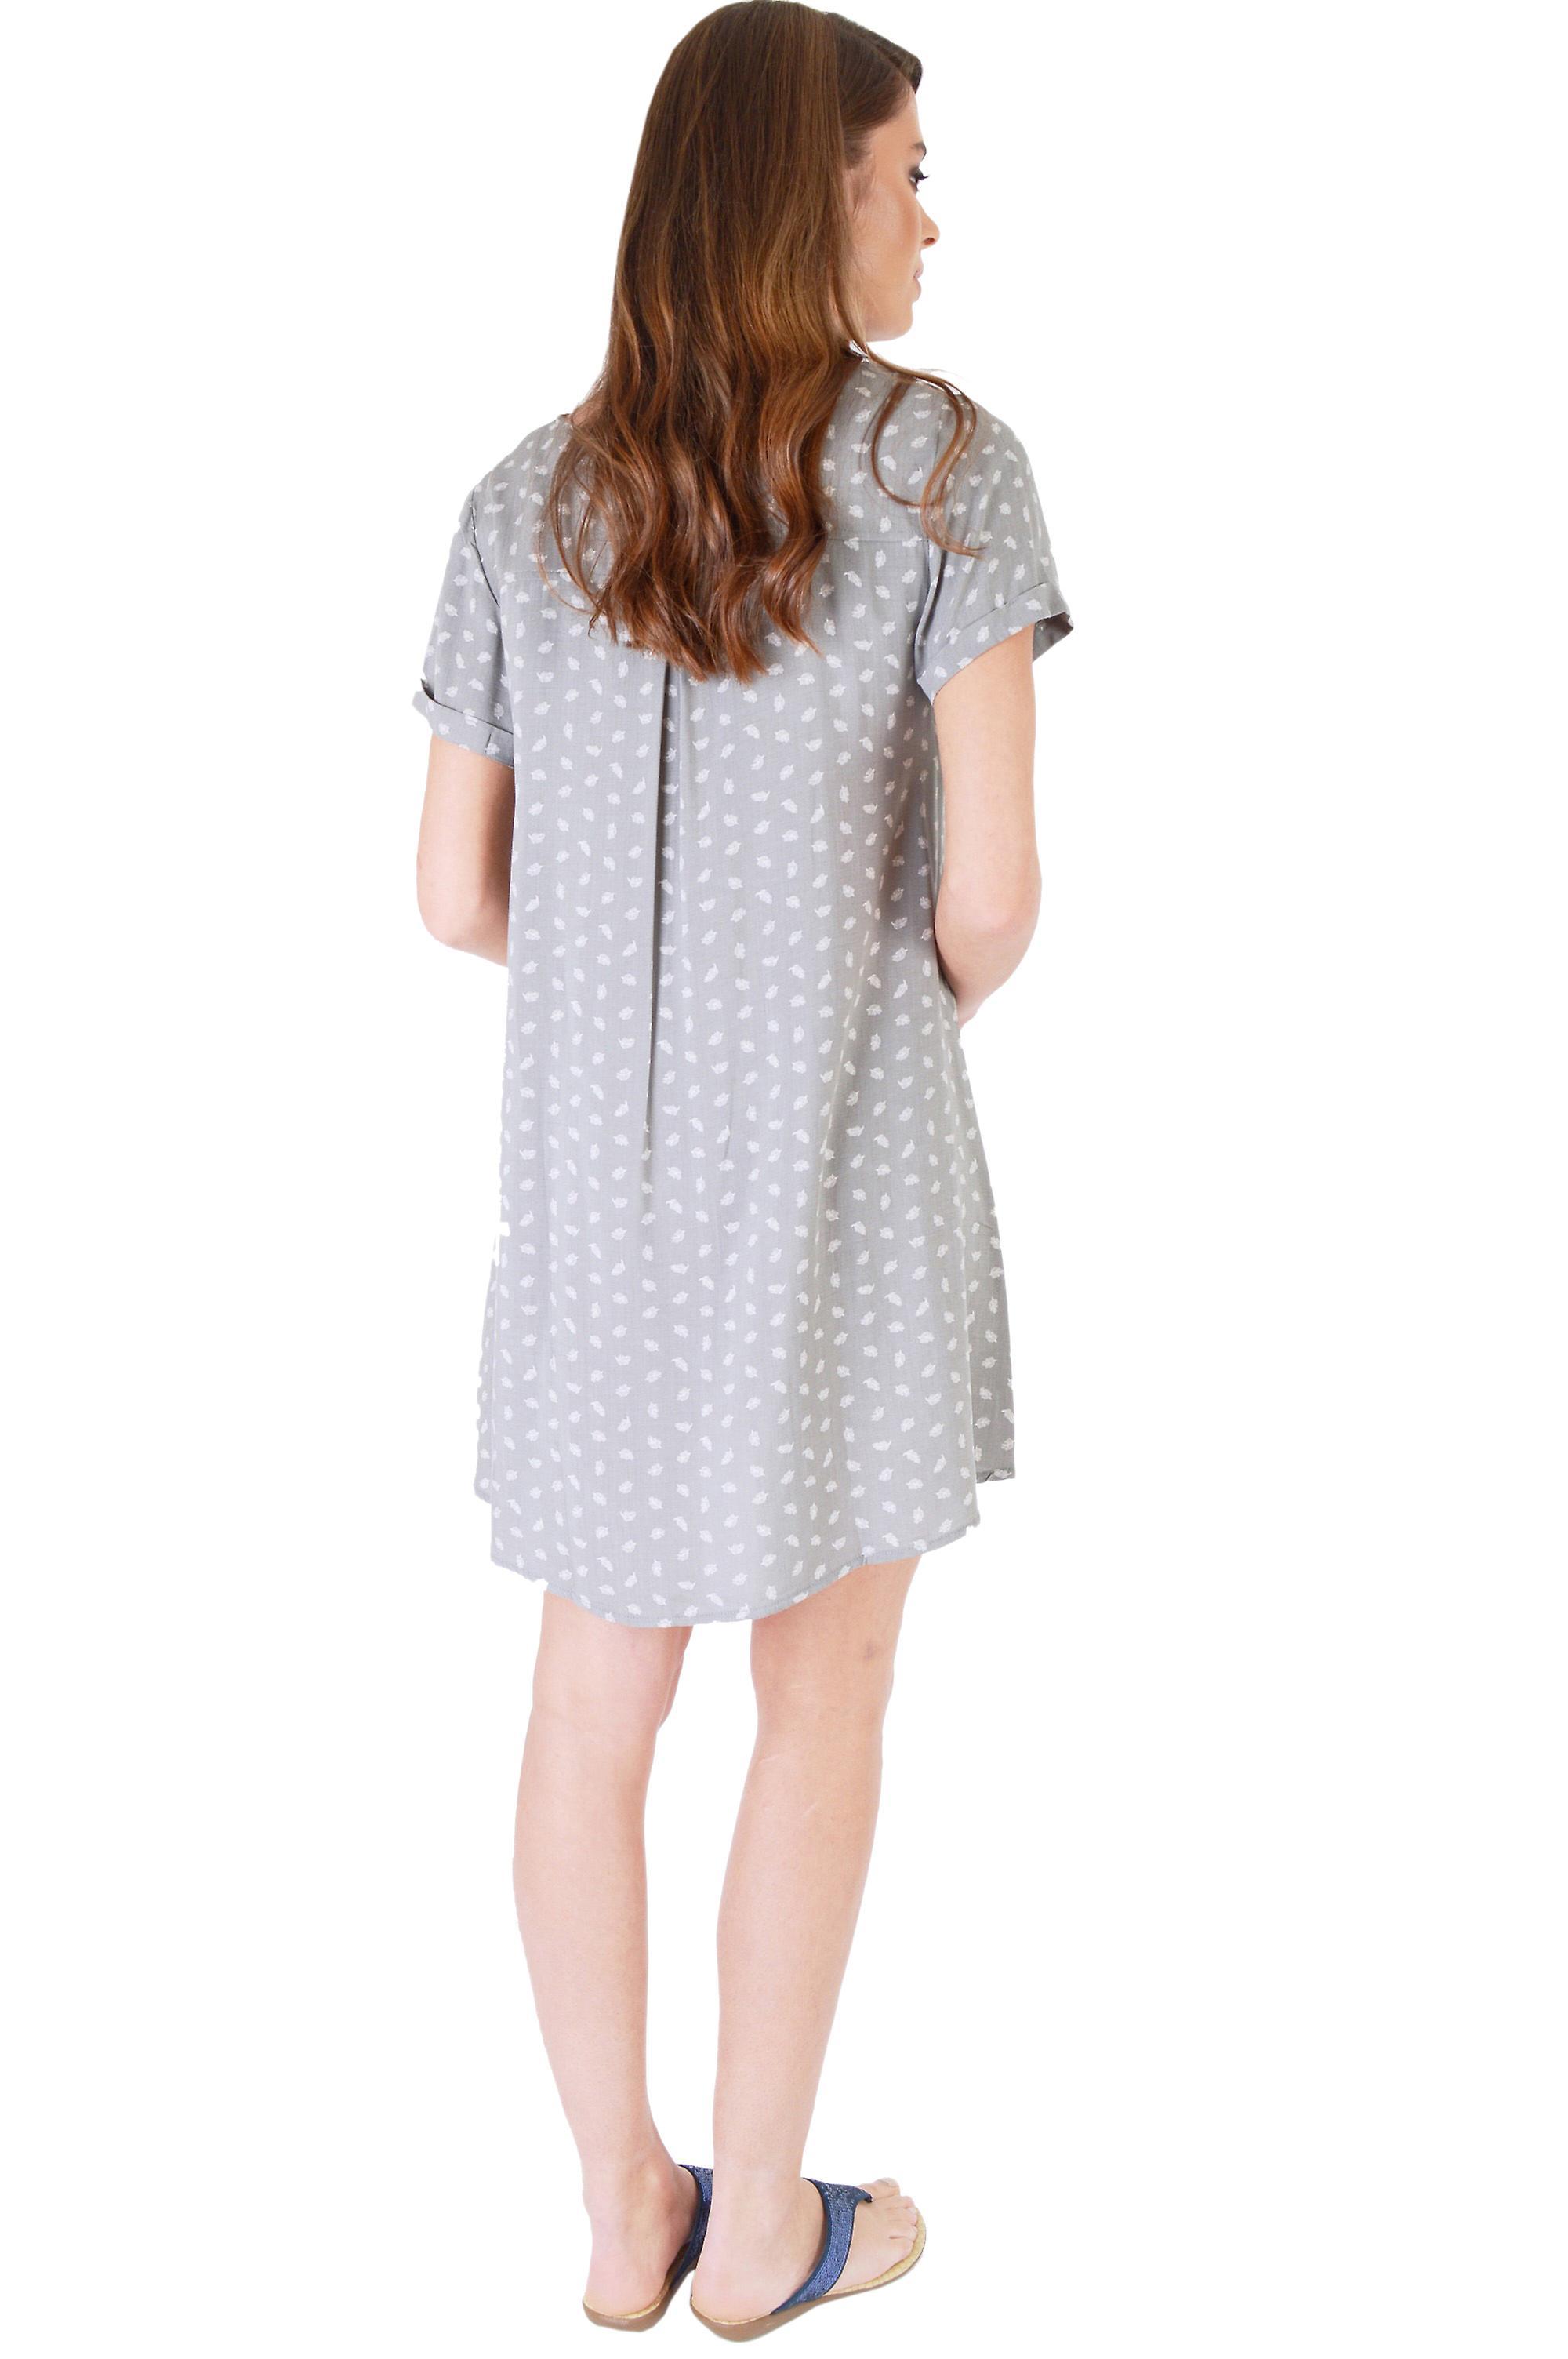 SHN Cuffed Slip Dress In Grey With White Leaf Print